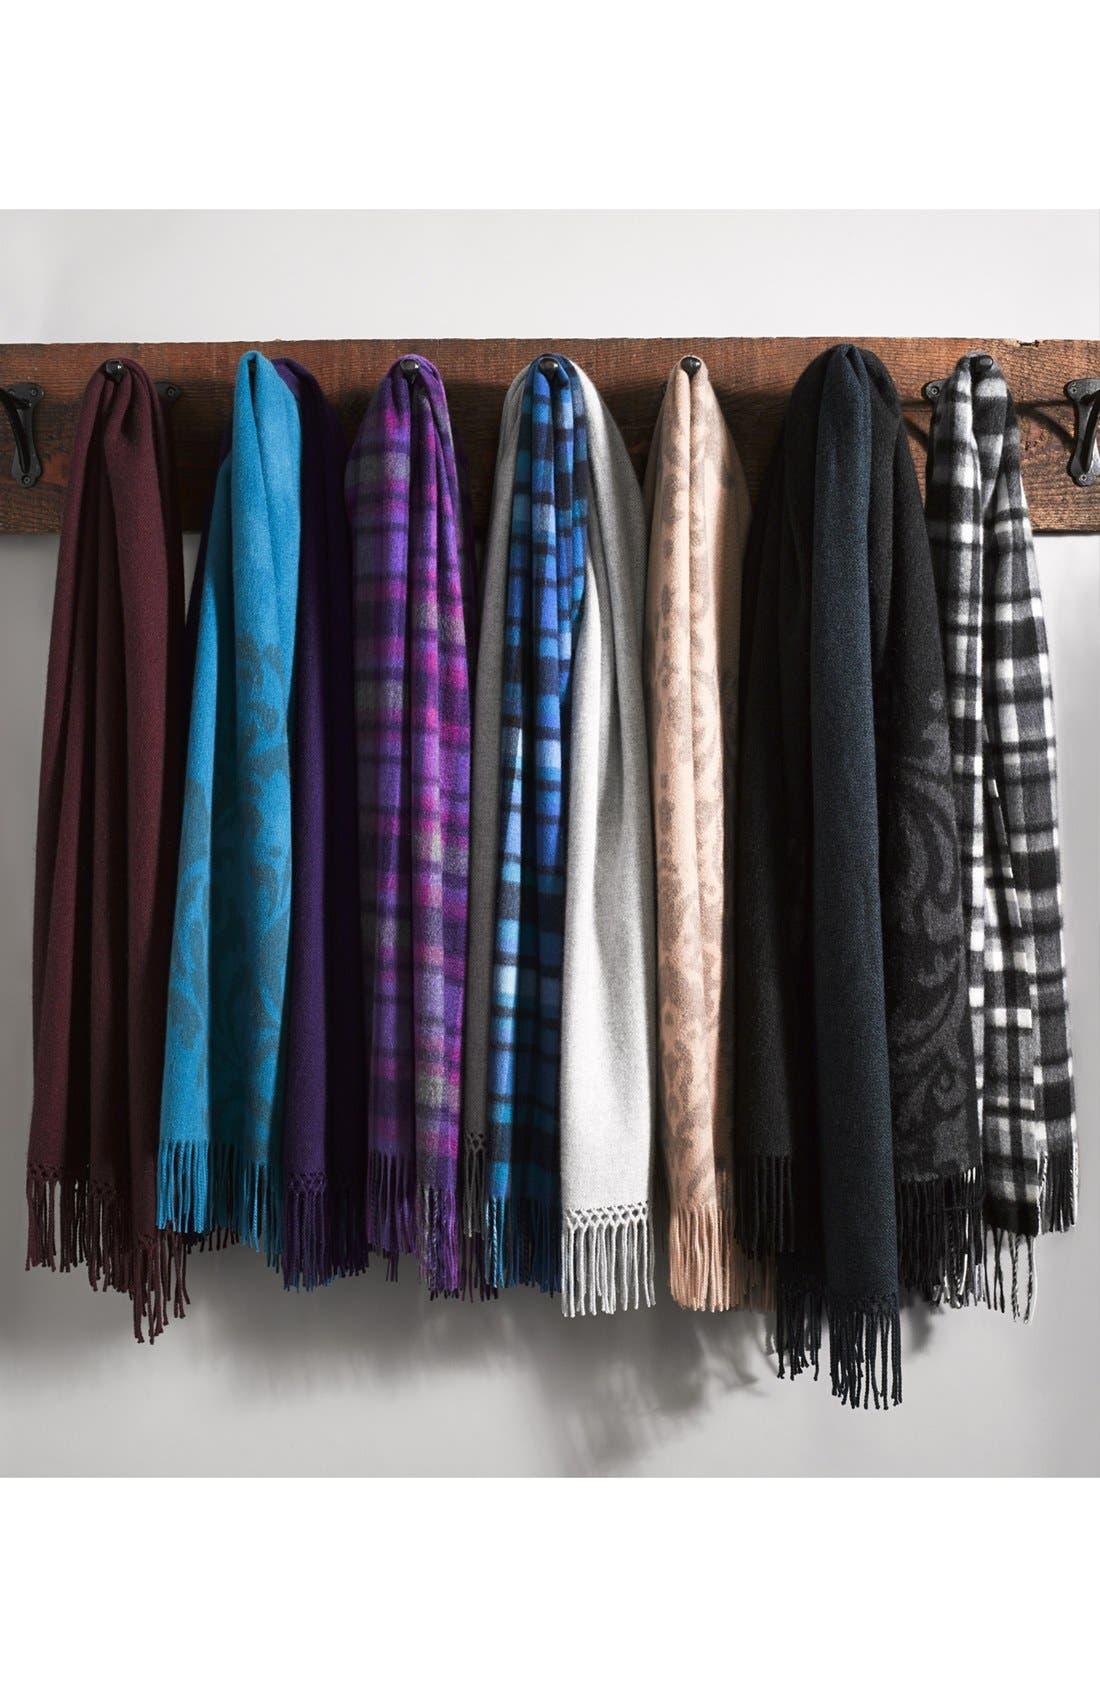 NORDSTROM,                             Woven Cashmere Wrap,                             Alternate thumbnail 3, color,                             001